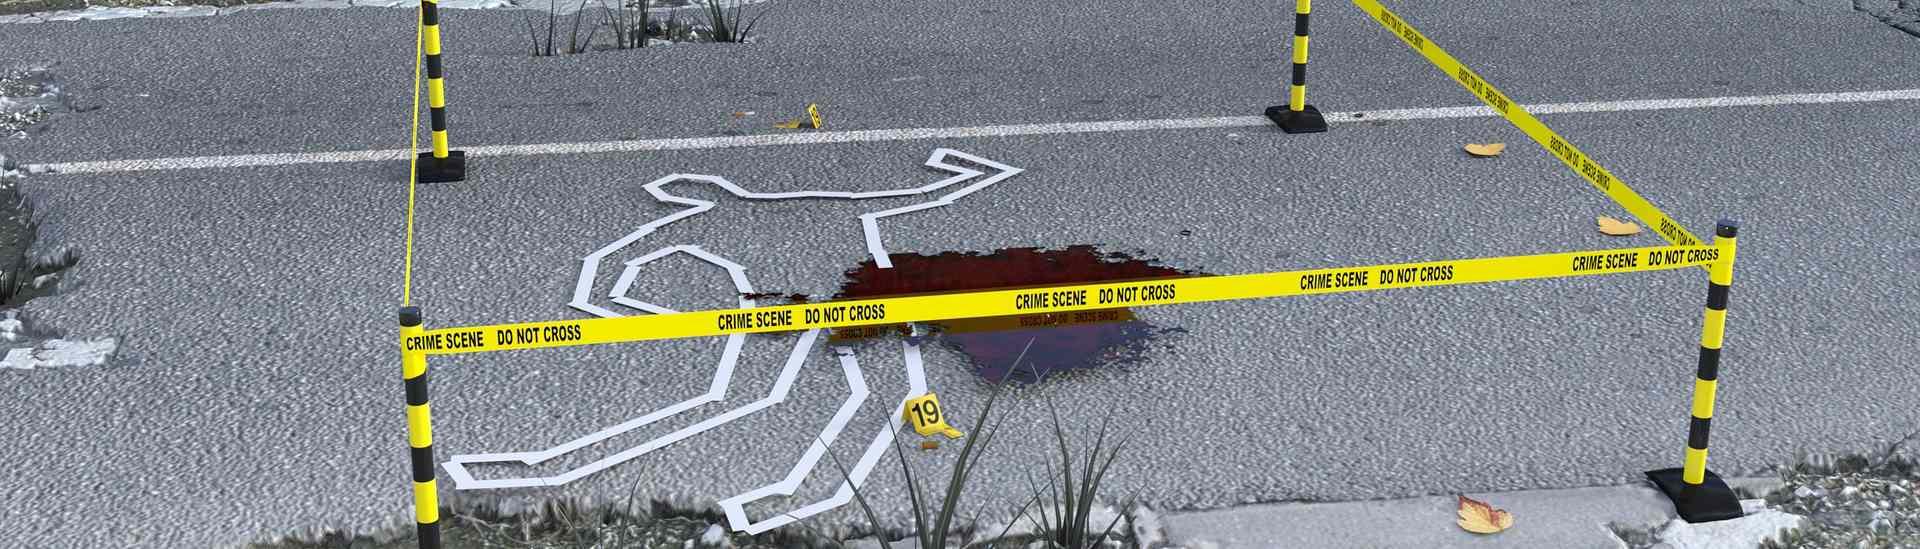 Forensic Crime Scene and Trauma Cleaning